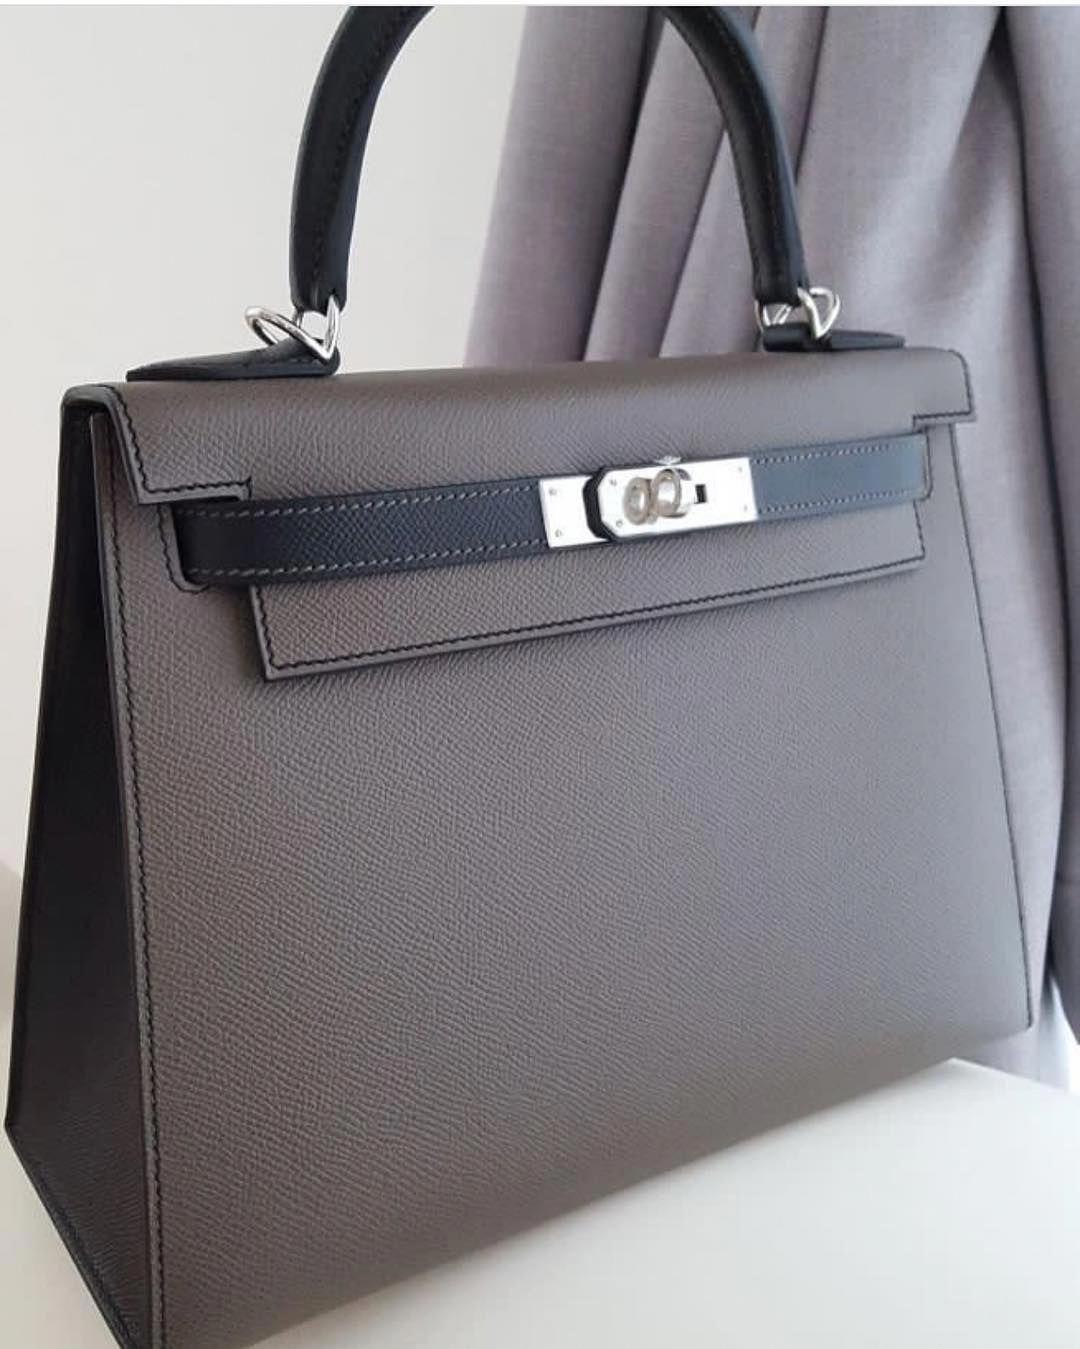 Hermes Kelly 28 Sellier HSS Etain   Black Epsom Phw A  Designerhandbags 2724b6a30e